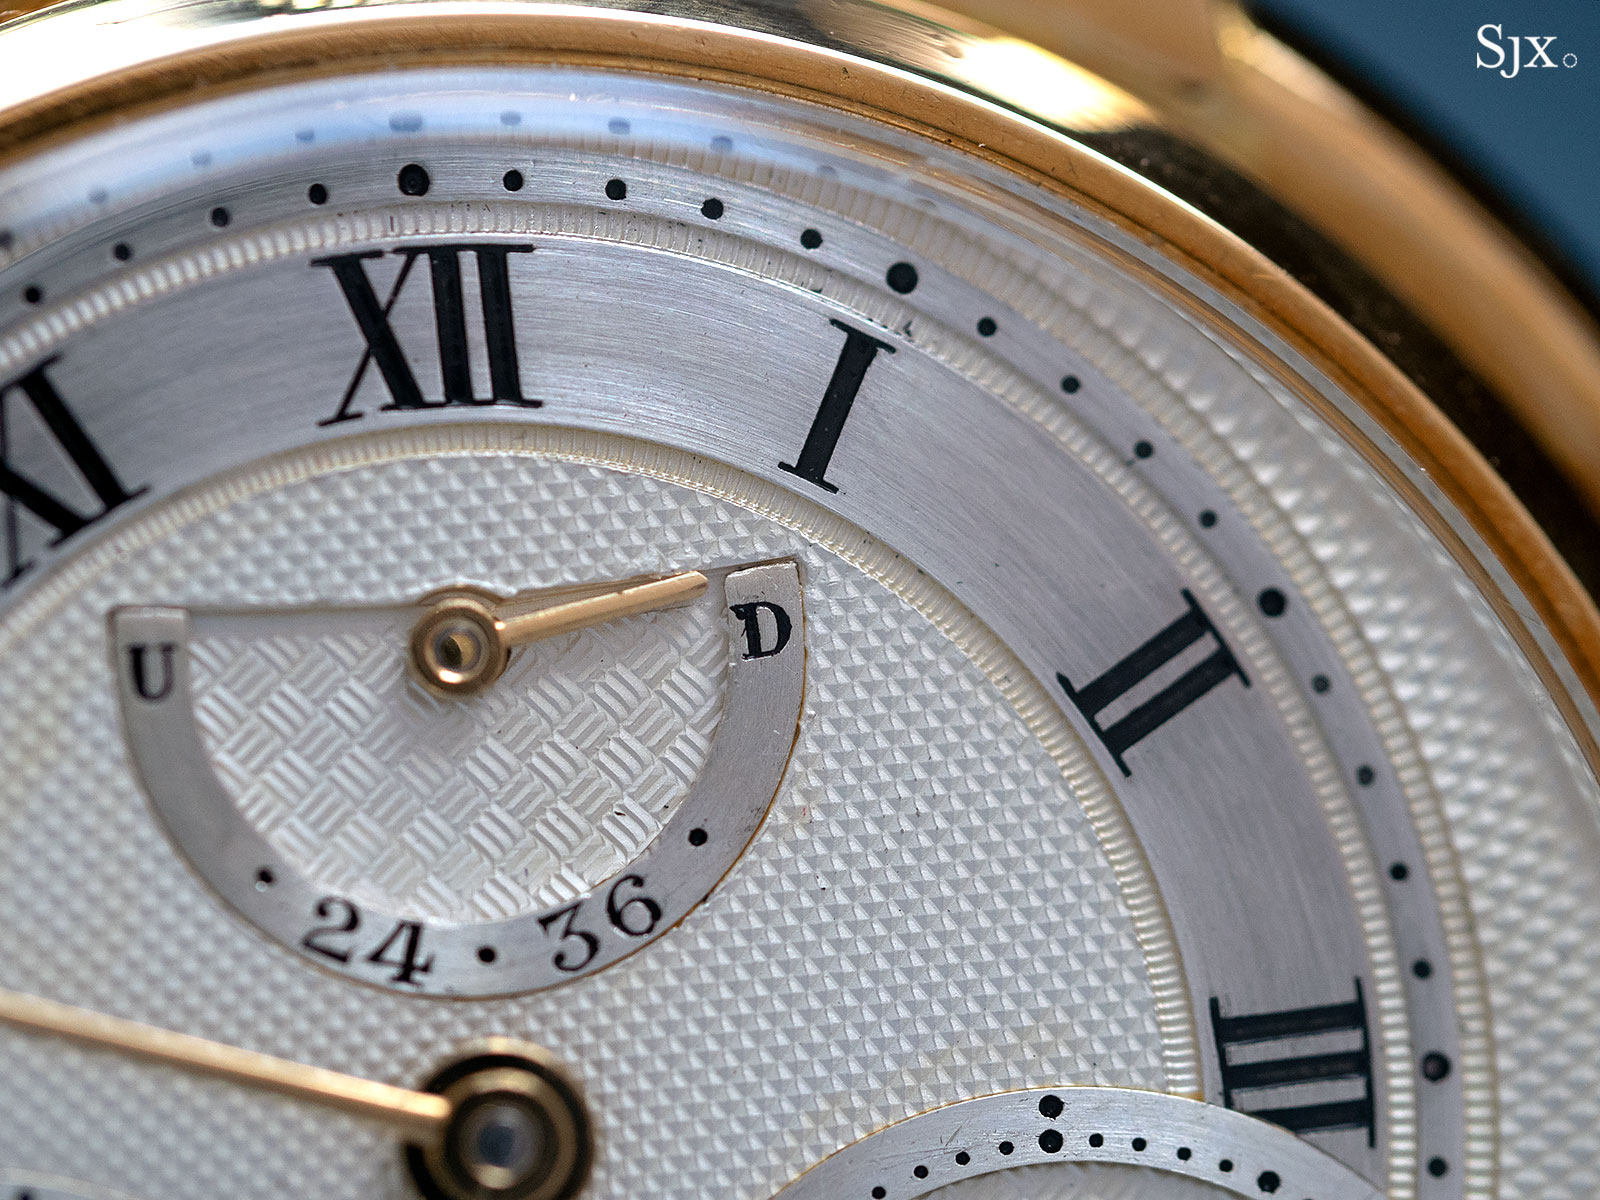 George Daniels Chronograph Wristwatch with tourbillon 7